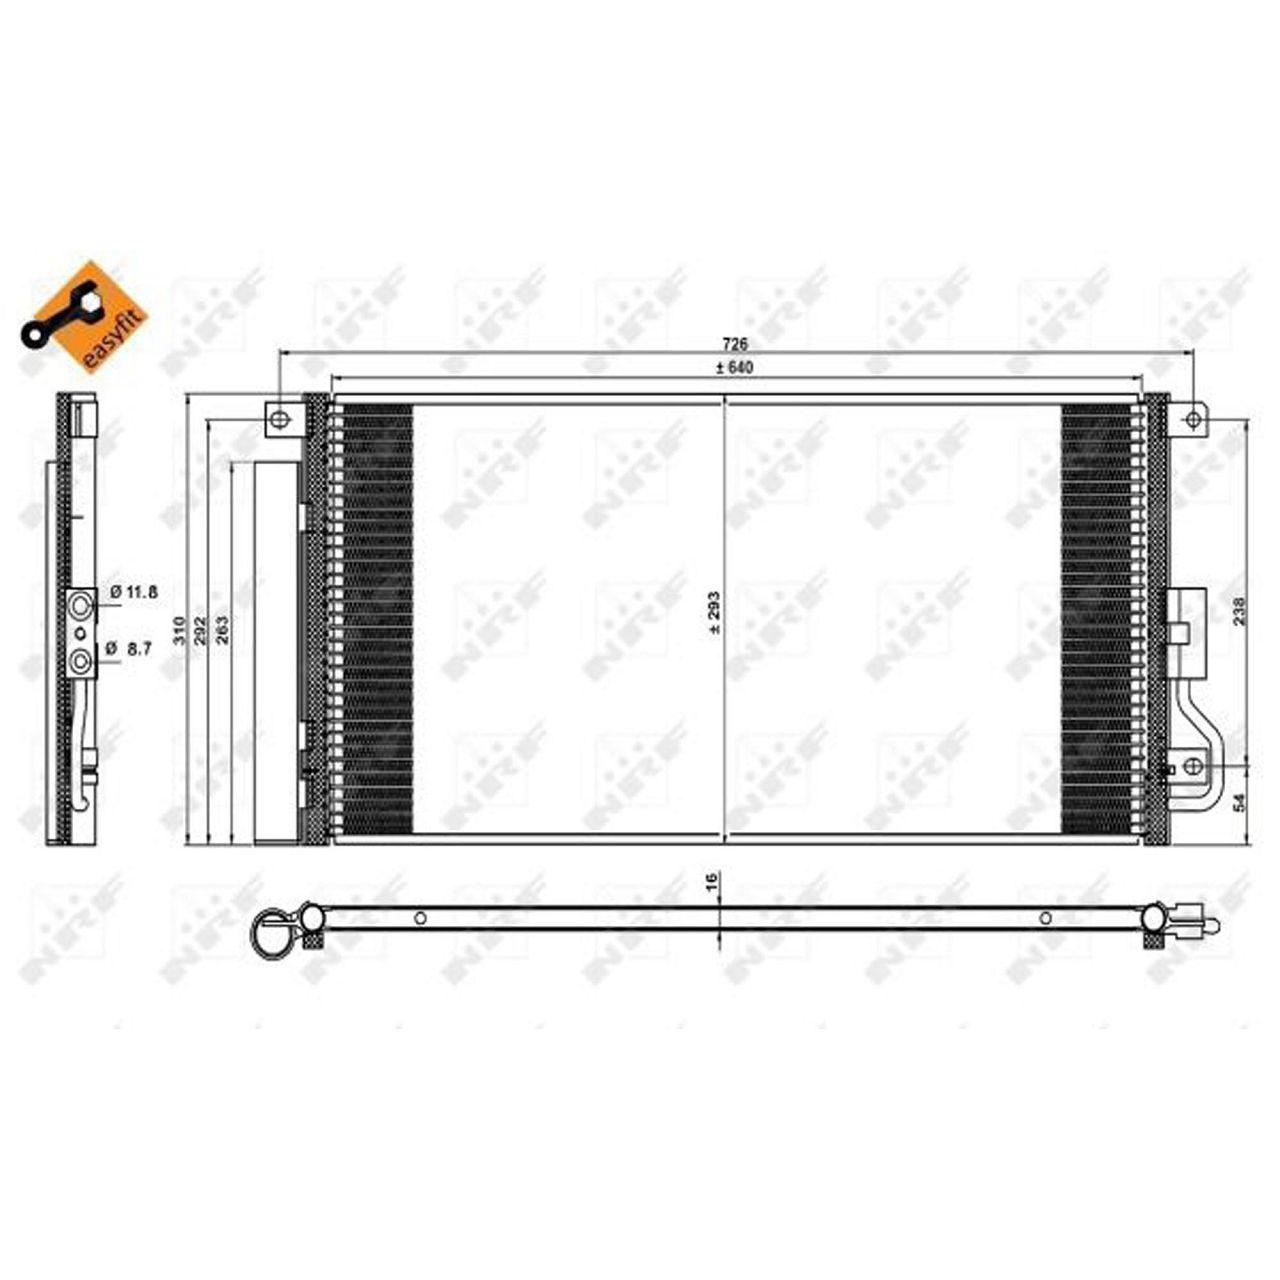 NRF 350227 EASY FIT Kondensator OPEL Mokka / X J13 1.4 1.6/1.7 CDTI CHEVROLET Trax 1850274